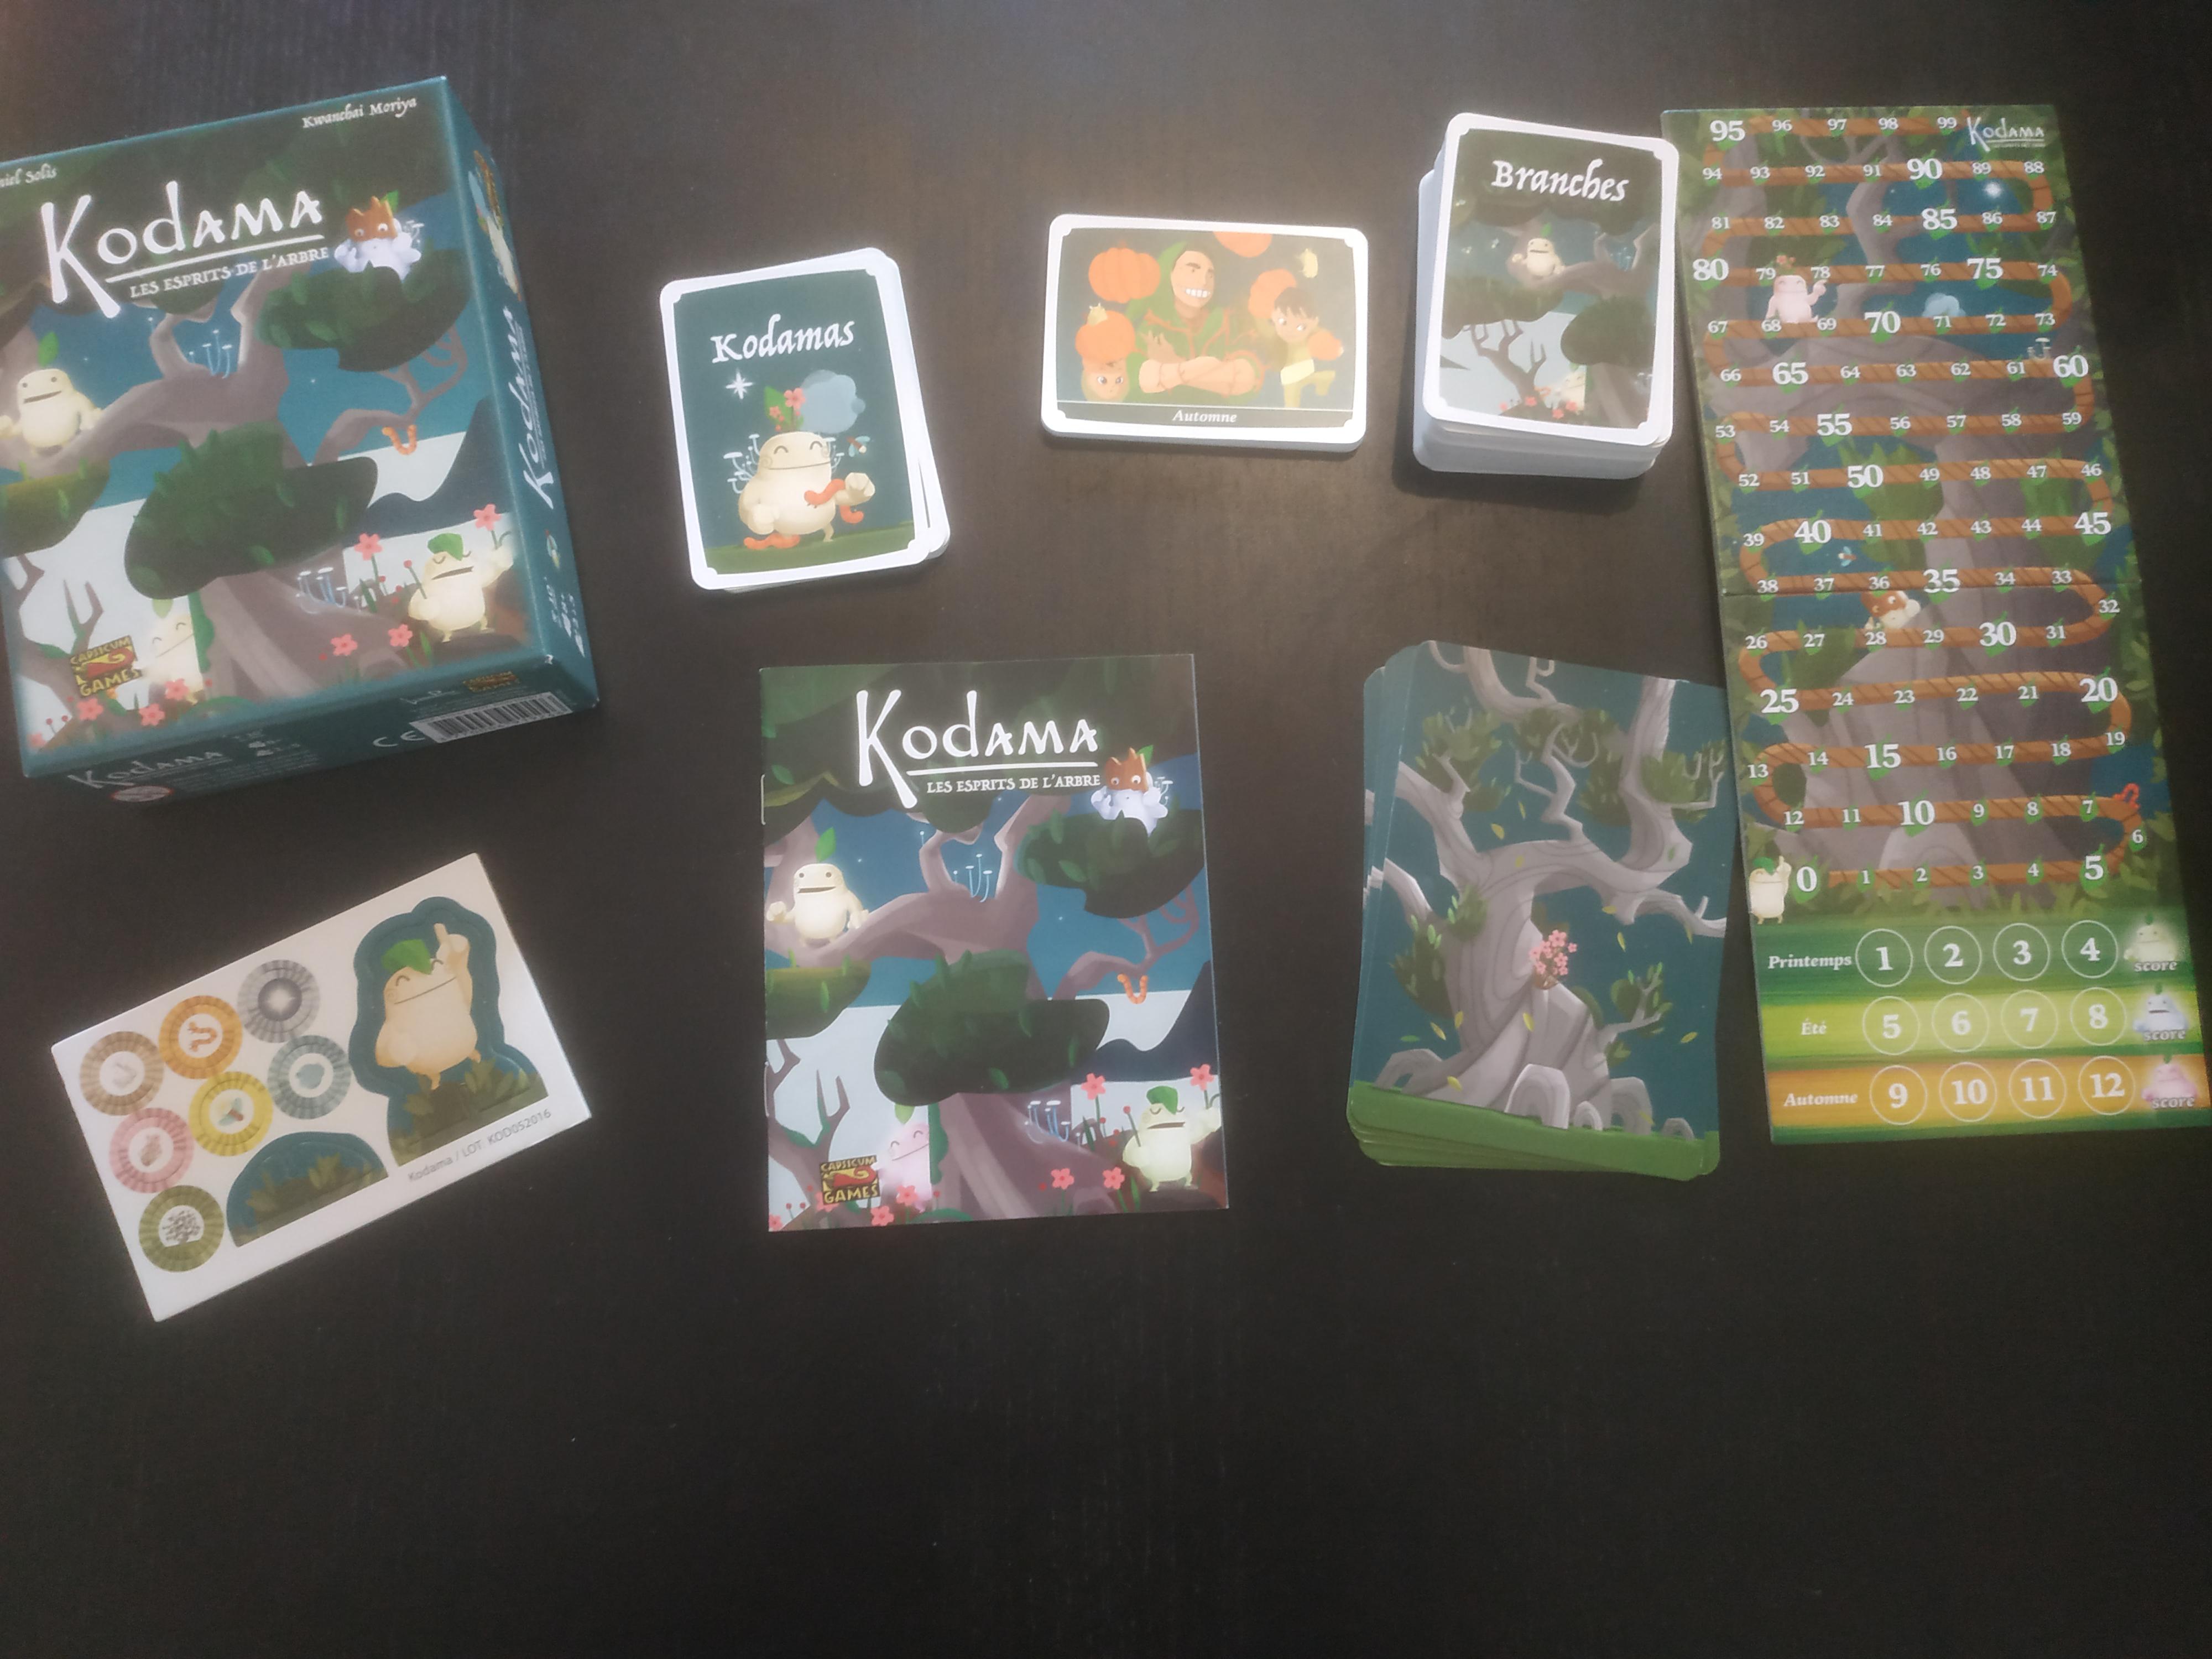 kodama-jeu-societe-famille-nature-zen-arbre-japon-pose-cartes